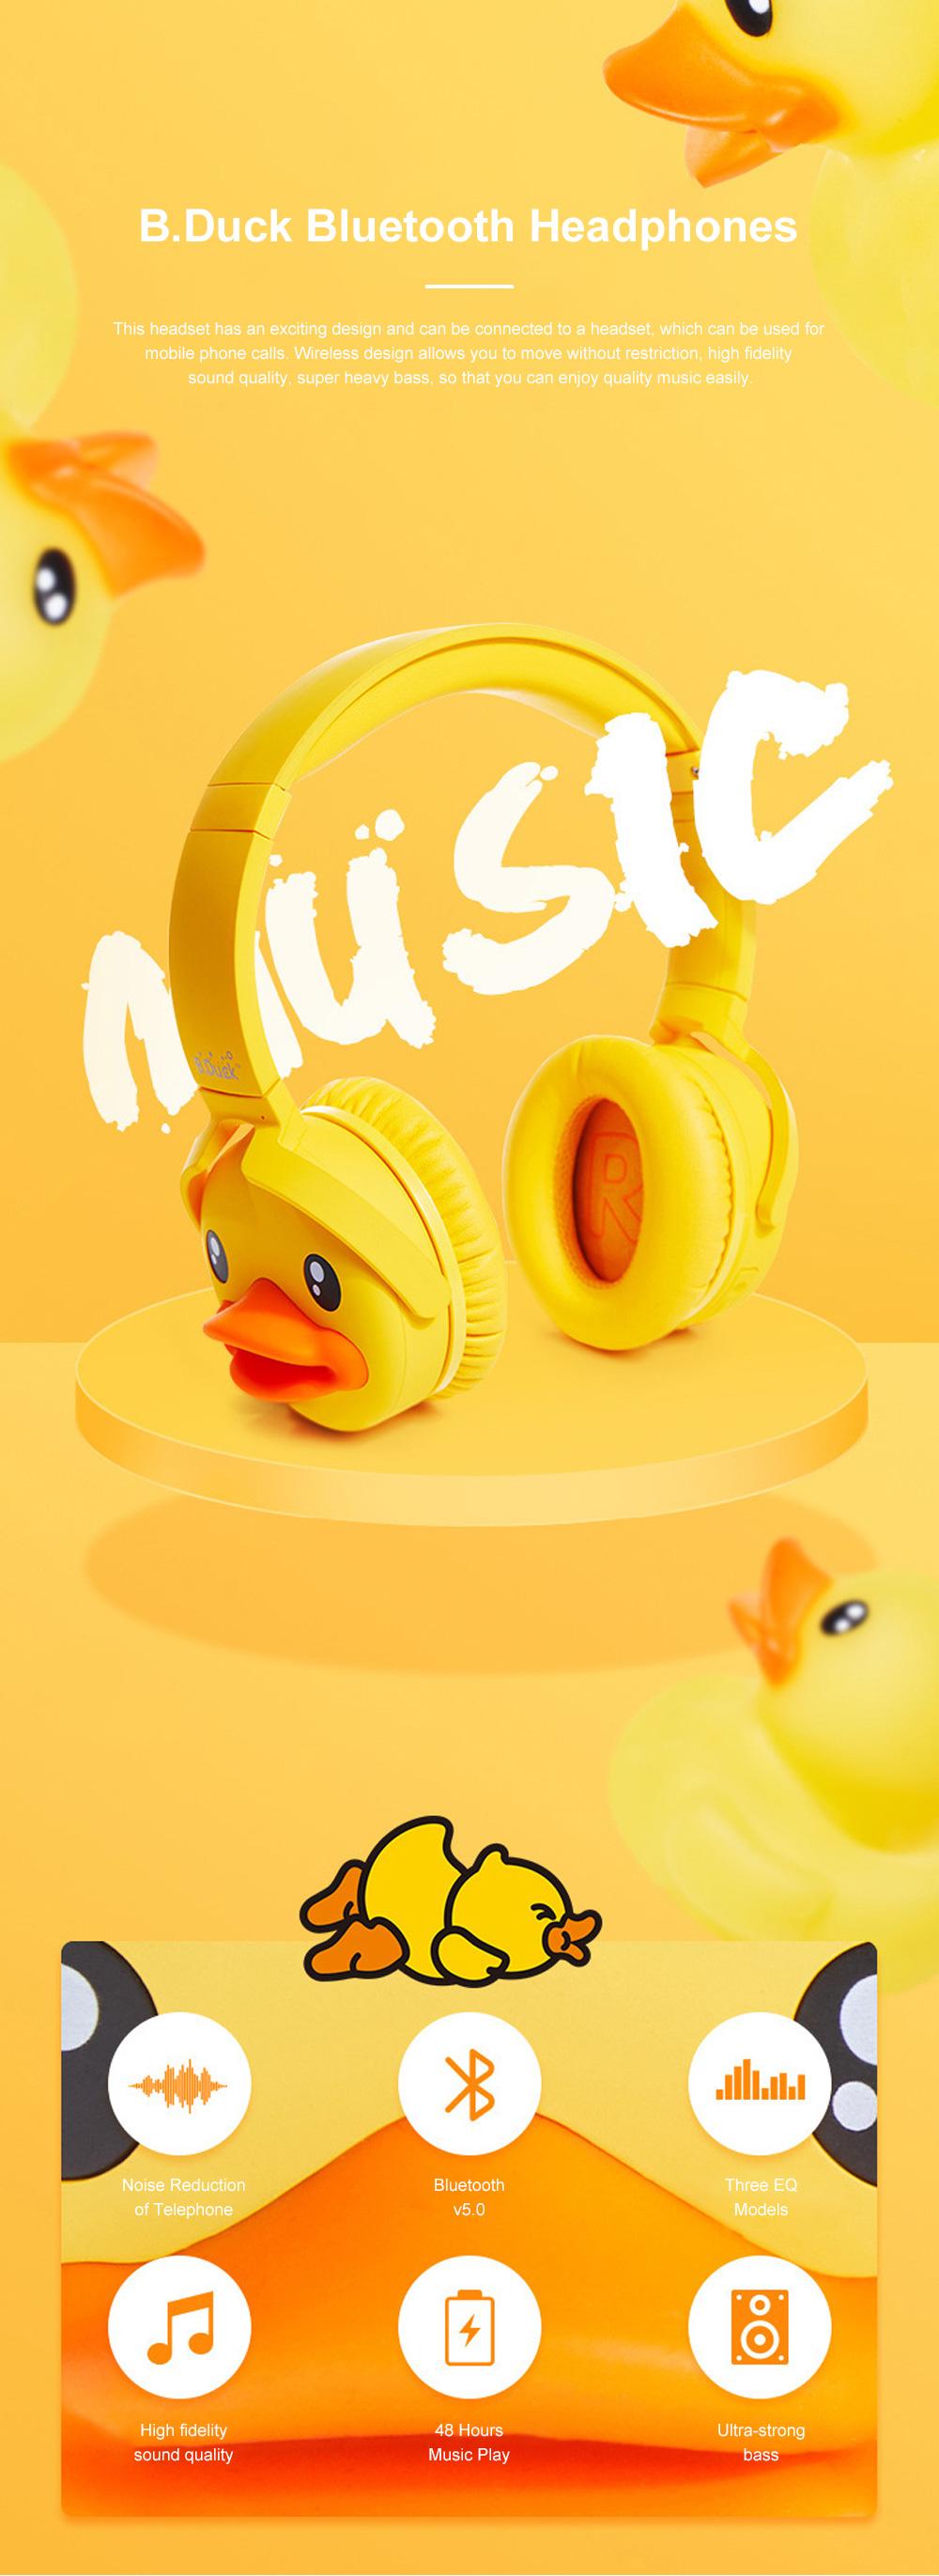 B.Duck Bluetooth Headphones Wireless Headset for Women Men Mobile Noise Reduction Sports Headphones Music Stereo 0